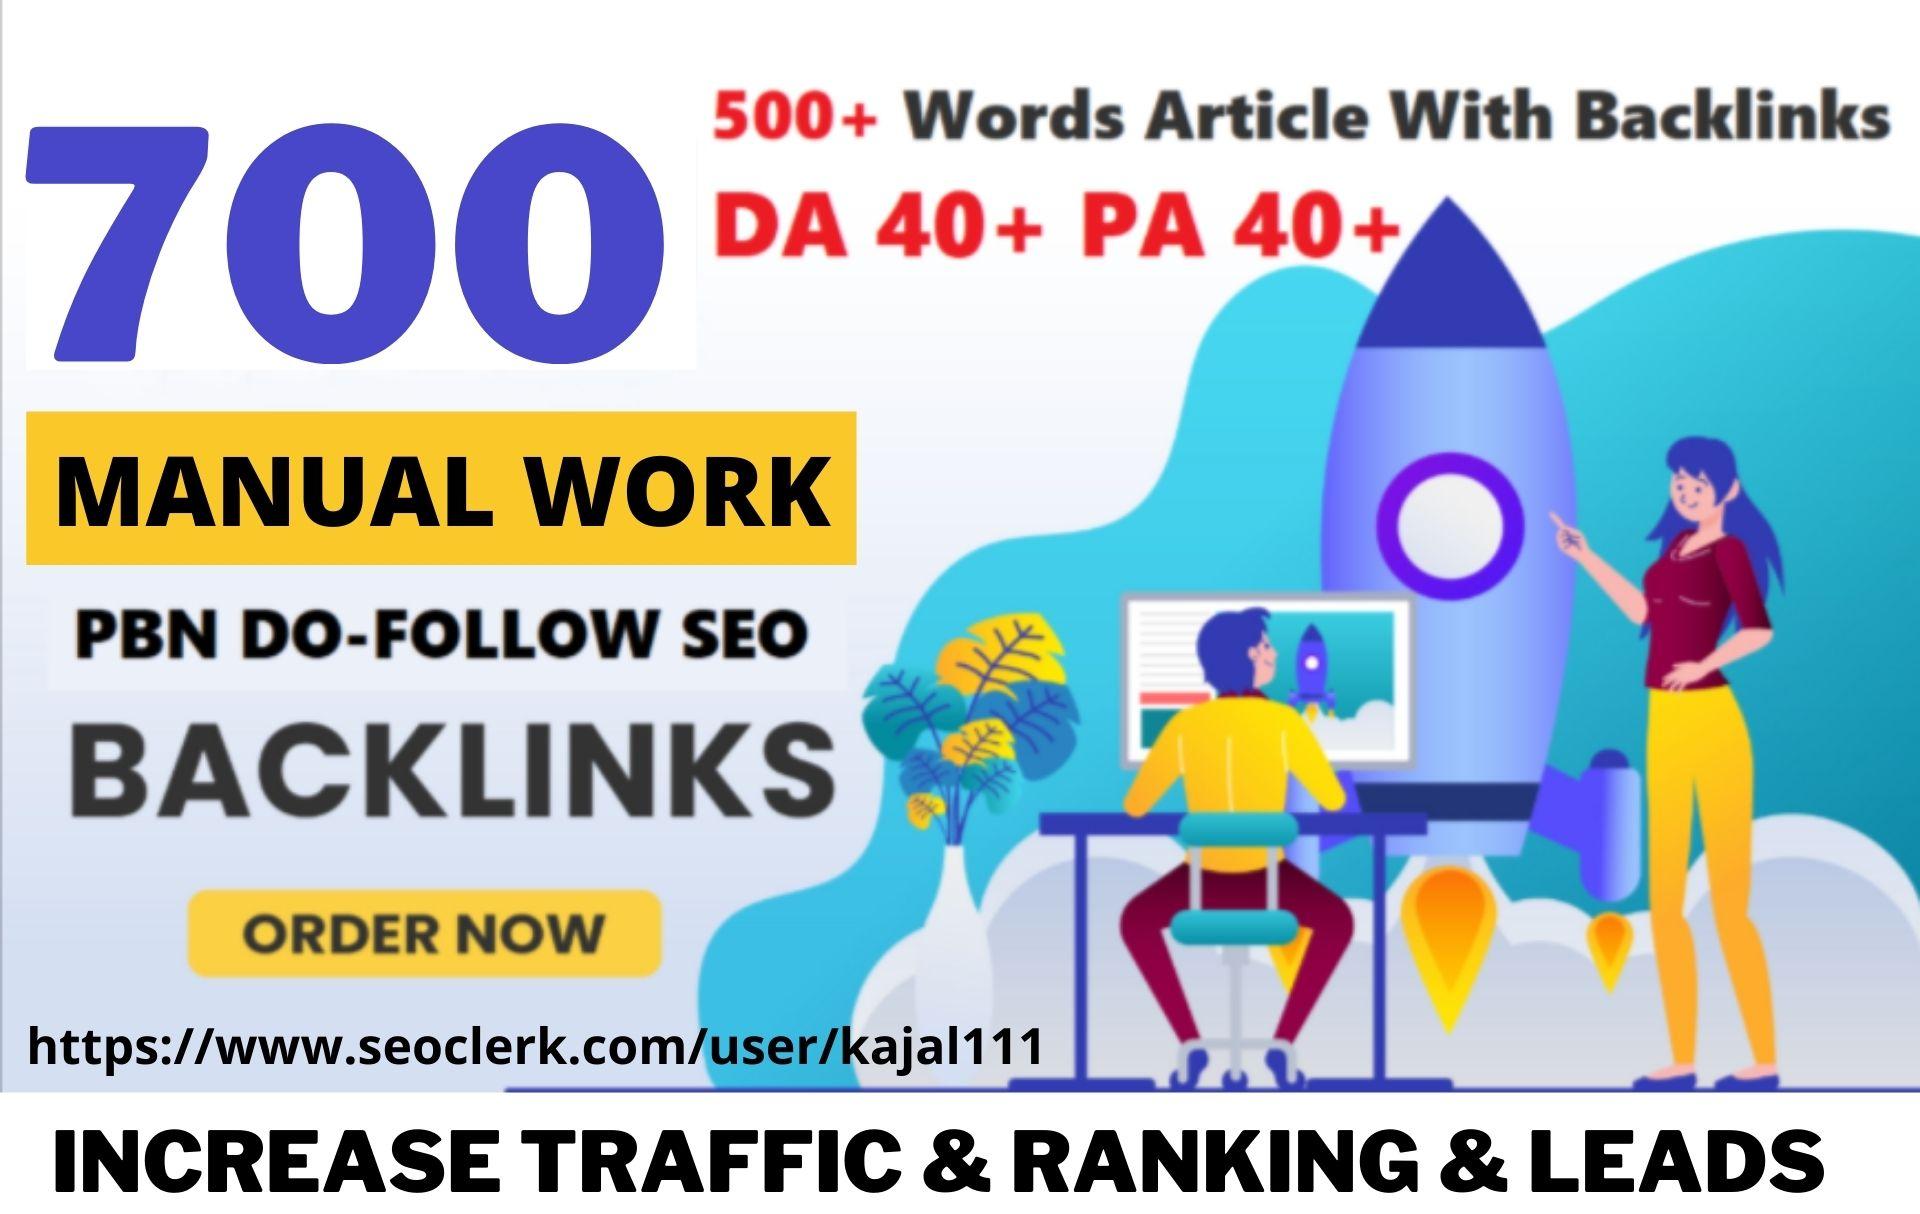 700+ Permanent PBN Backlinks Web2.0 With High DA 40+PA40+ Do-follow Links Homepage Unique website